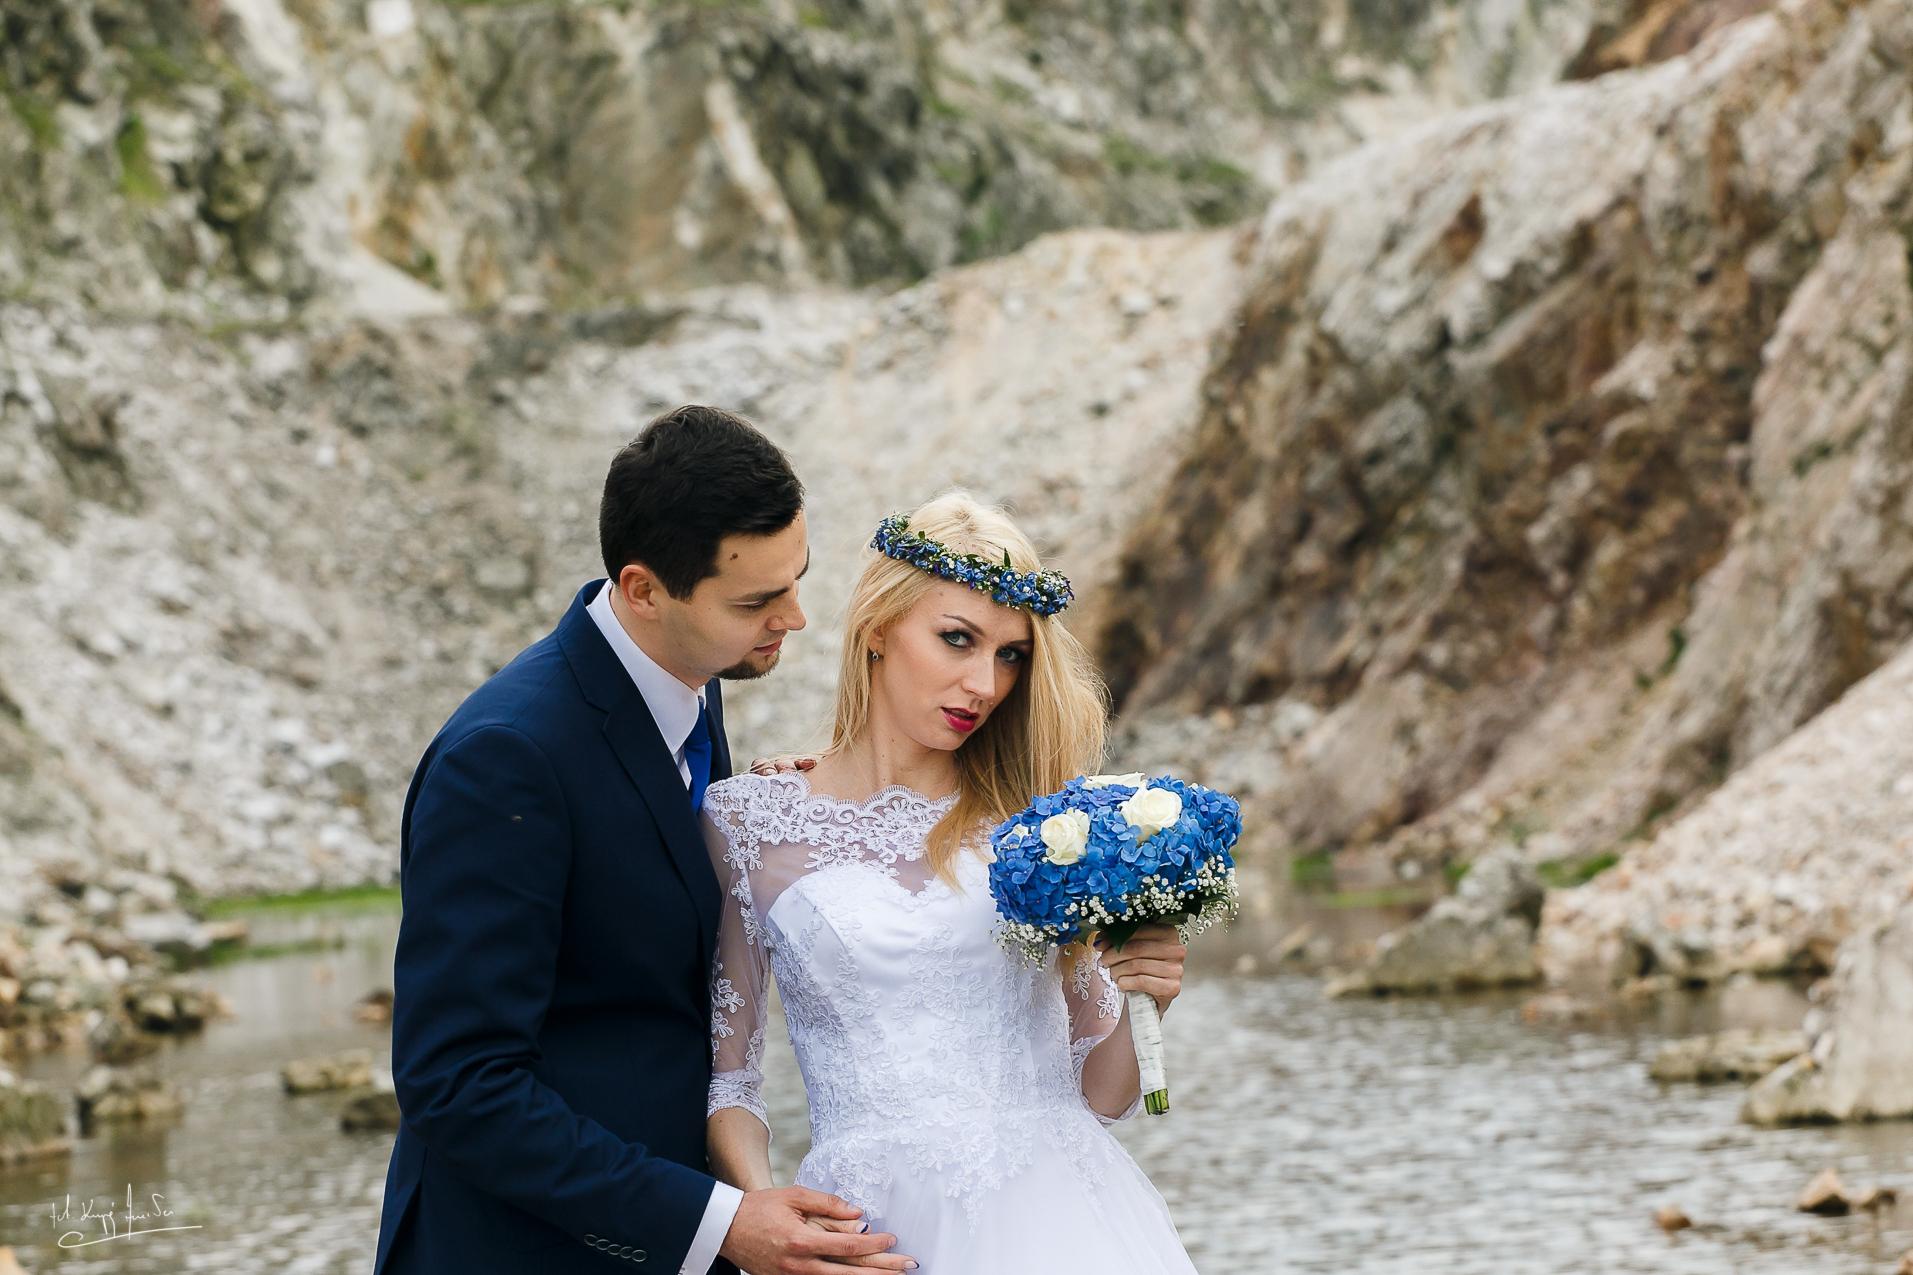 Ślub wesele szklarska poręba 48 Marta & Sławek